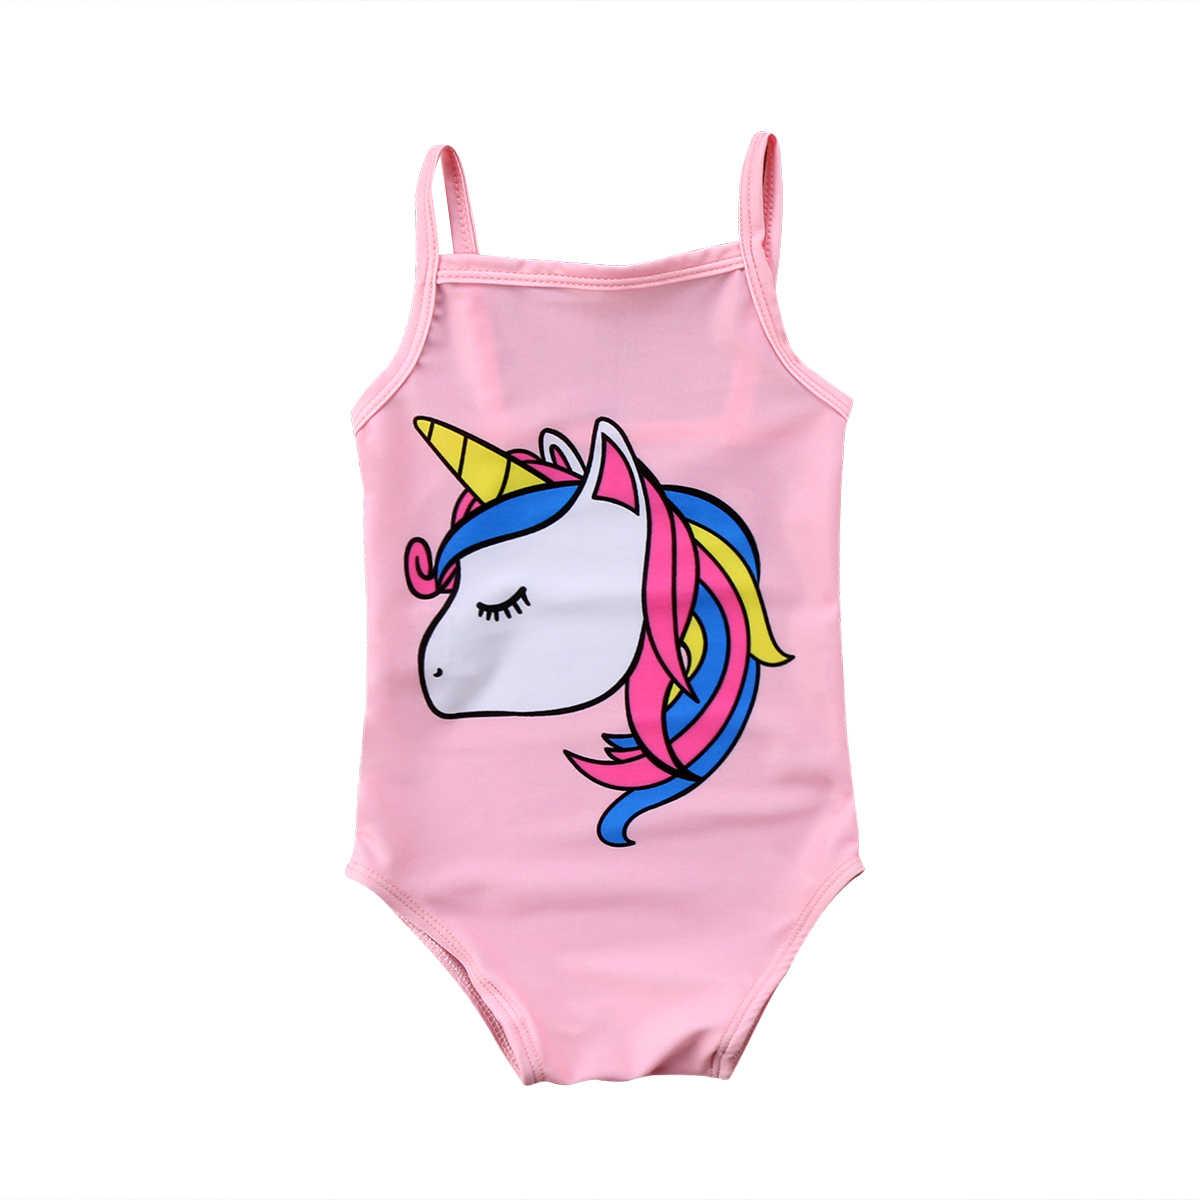 c28a006f6 ... 2019 Brand New Newborn Toddler Infant Kids Baby Girl Unicorn Swimwear  One-piece Swimsuit Bathing ...